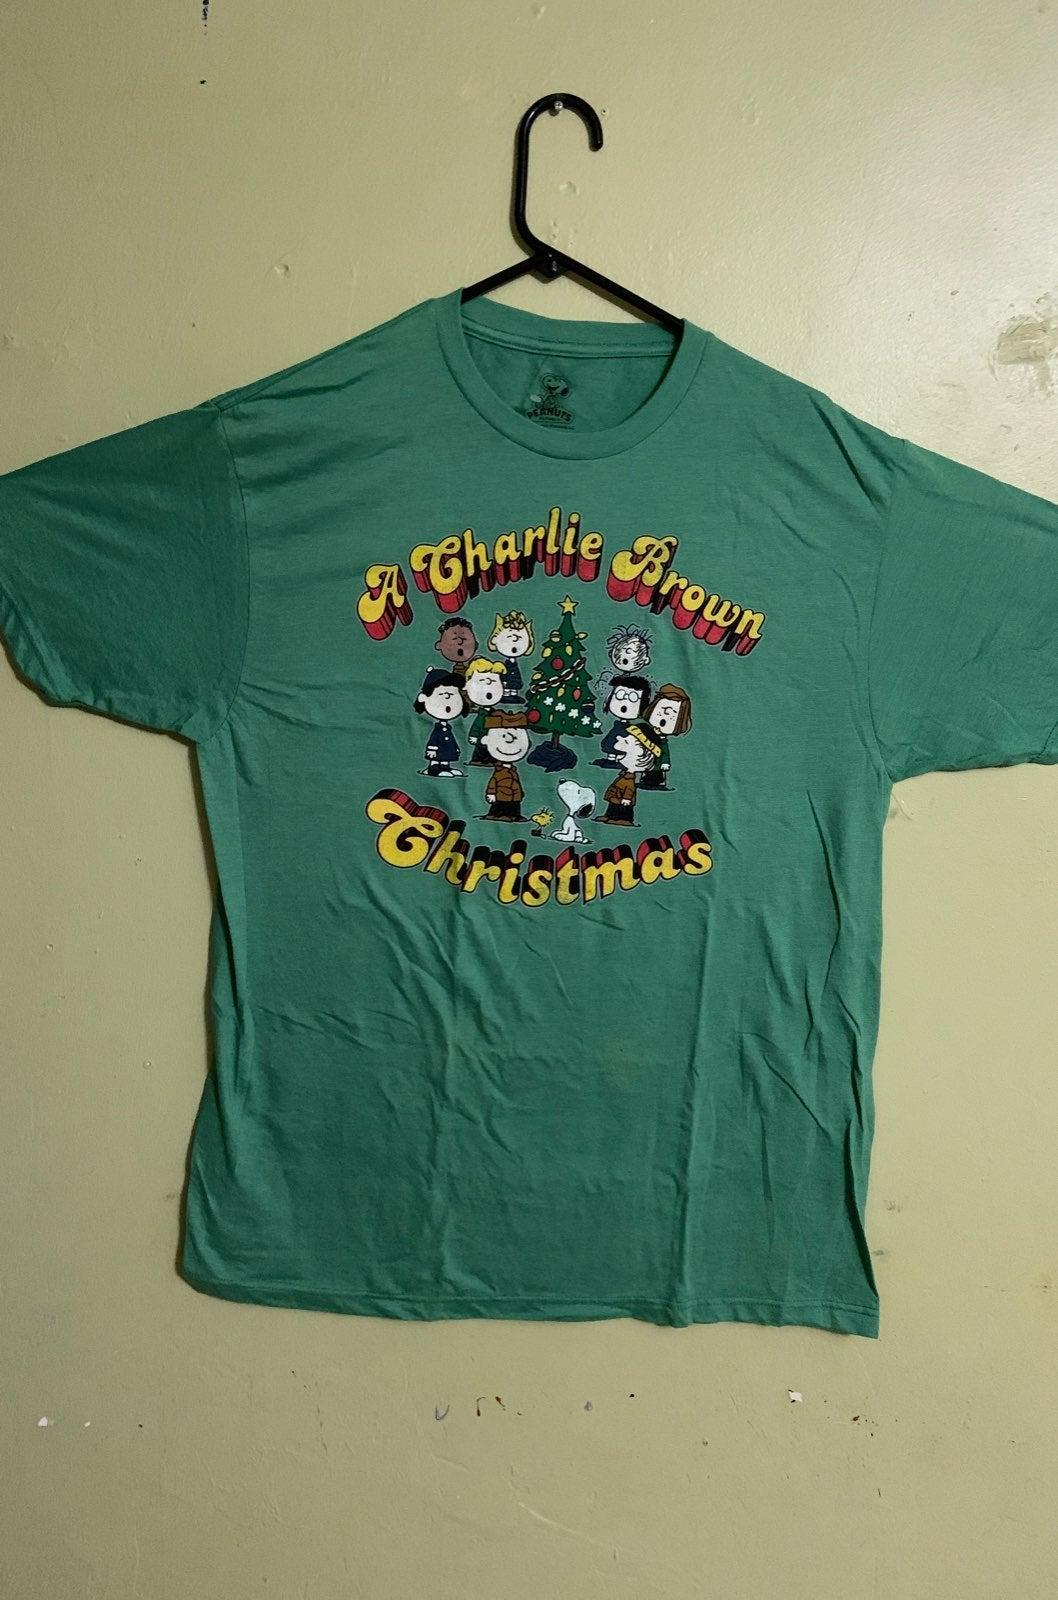 Peanuts Charlie brown Christmas shirt